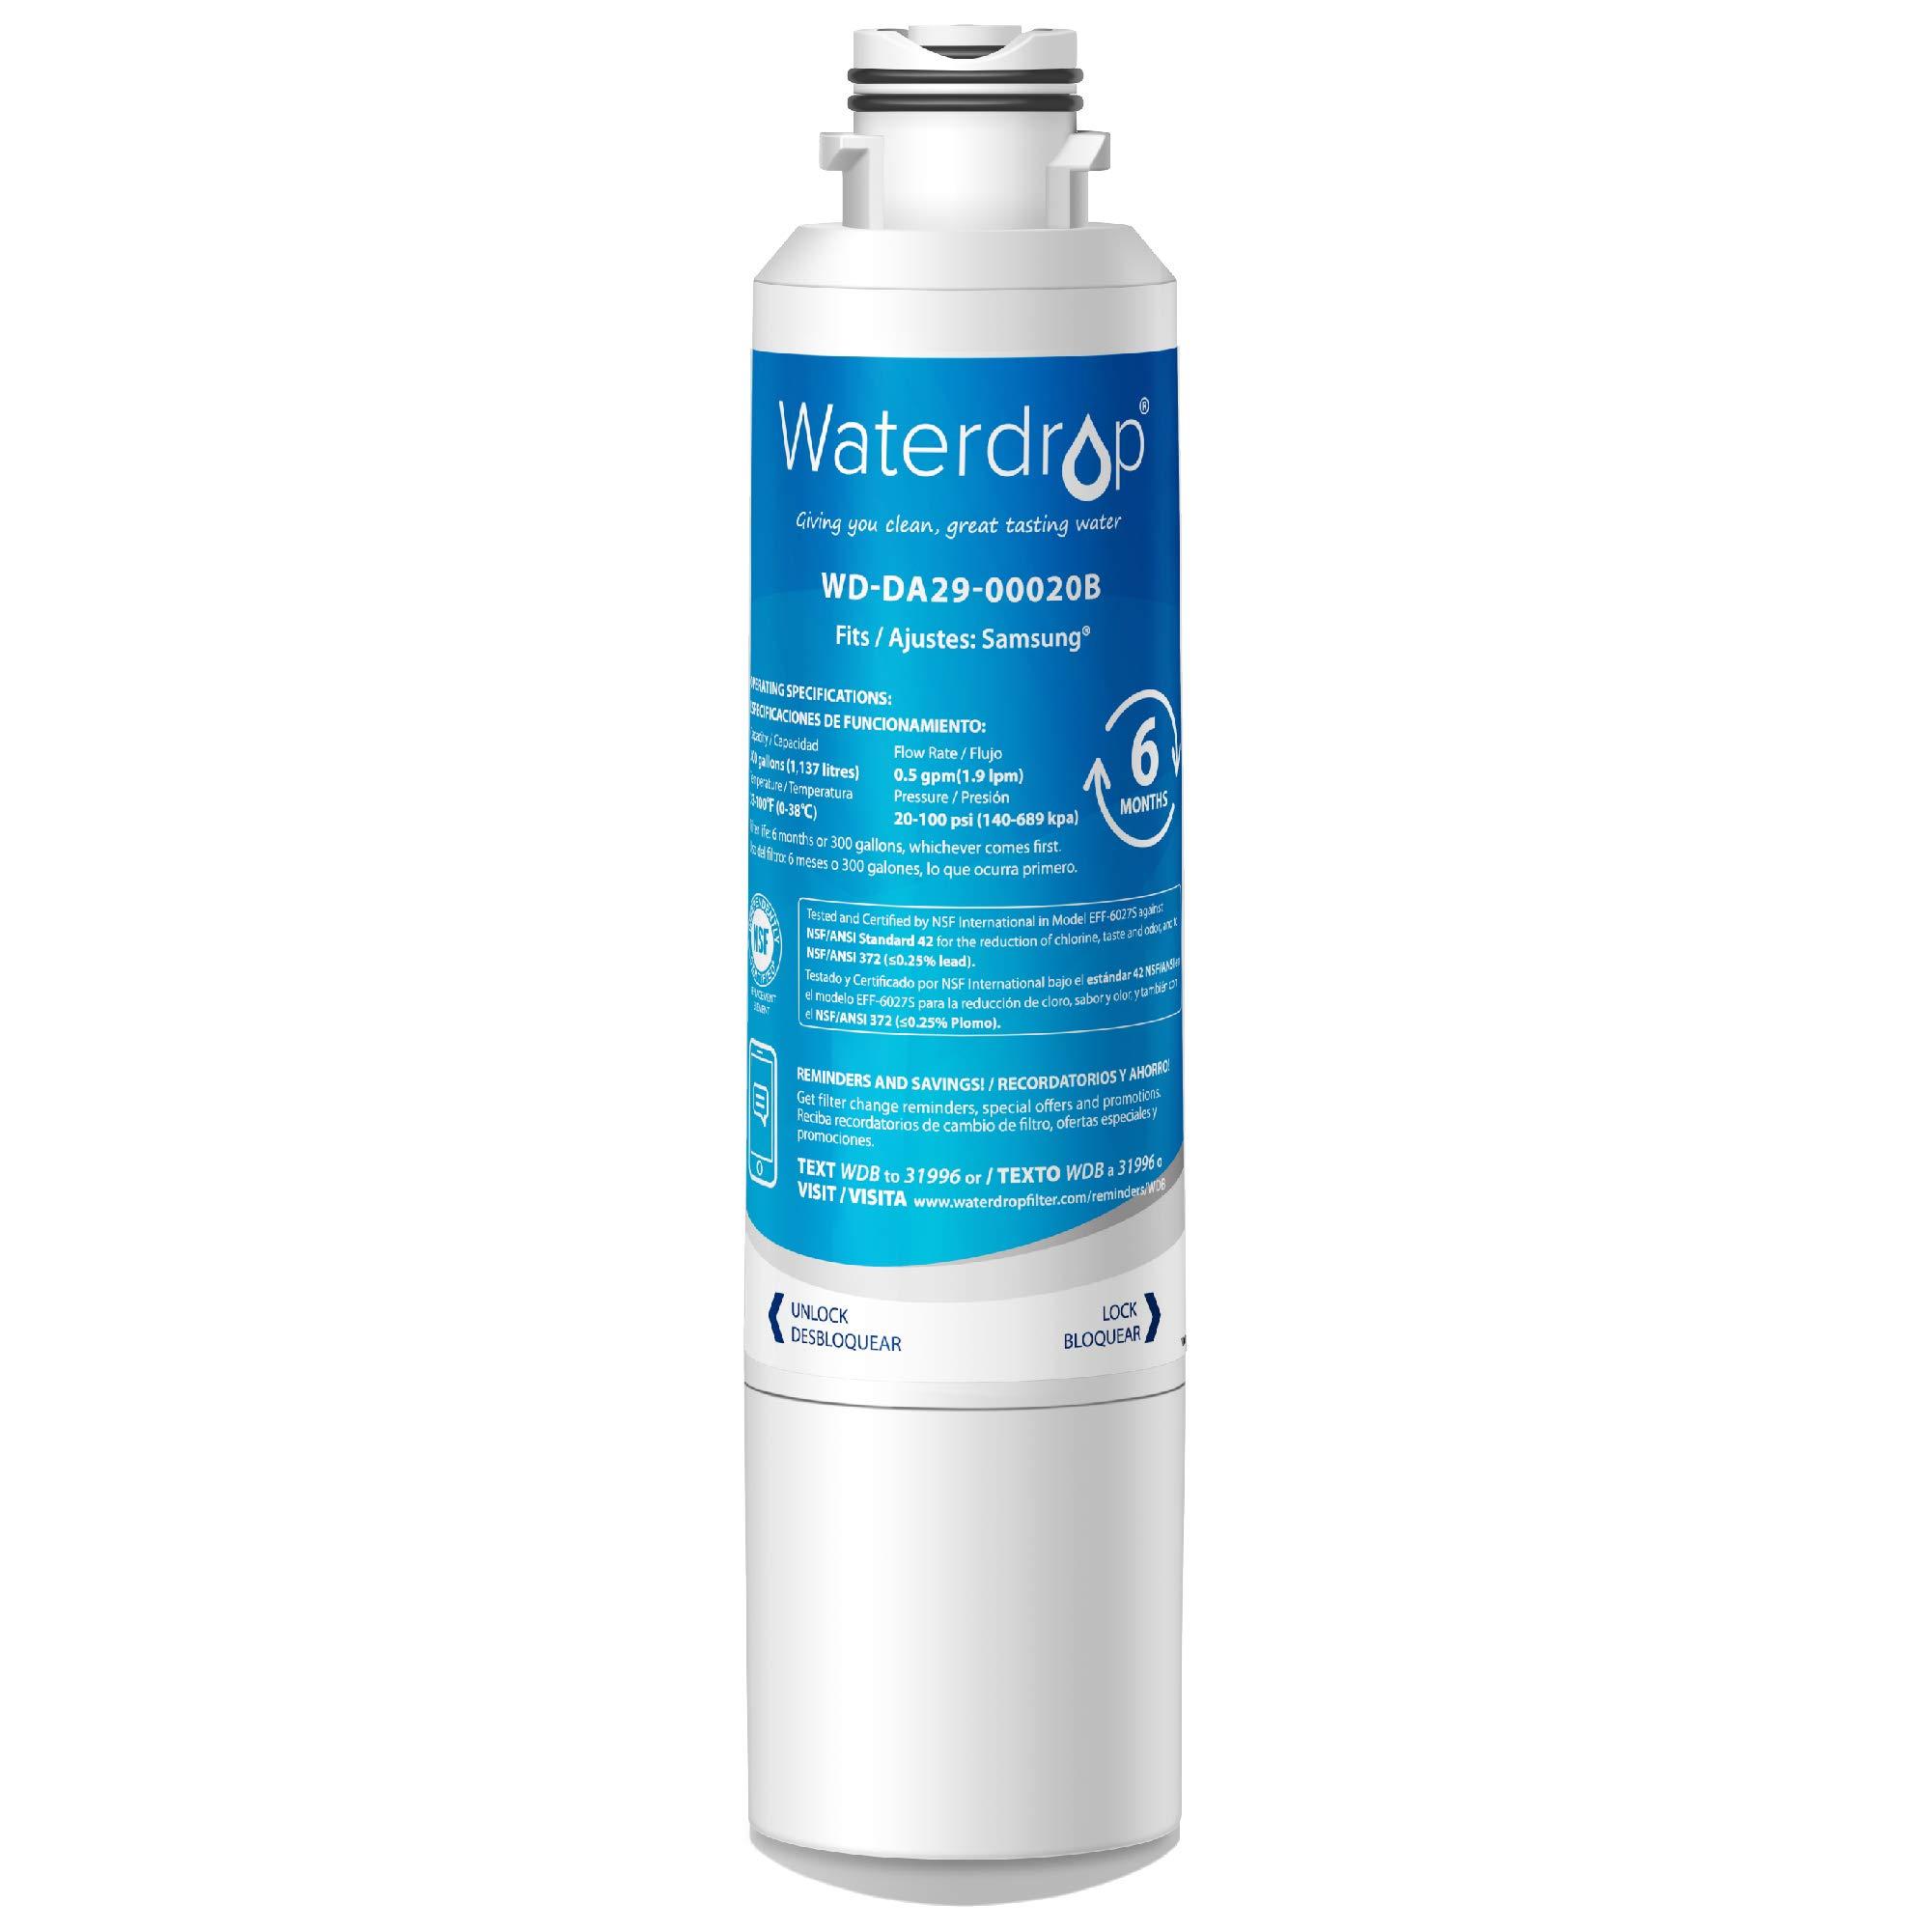 Waterdrop DA29-00020B Refrigerator Water Filter, Compatible with Samsung DA29-00020B, DA29-00020A, HAF-CIN/EXP, 46-9101, Standard by Waterdrop